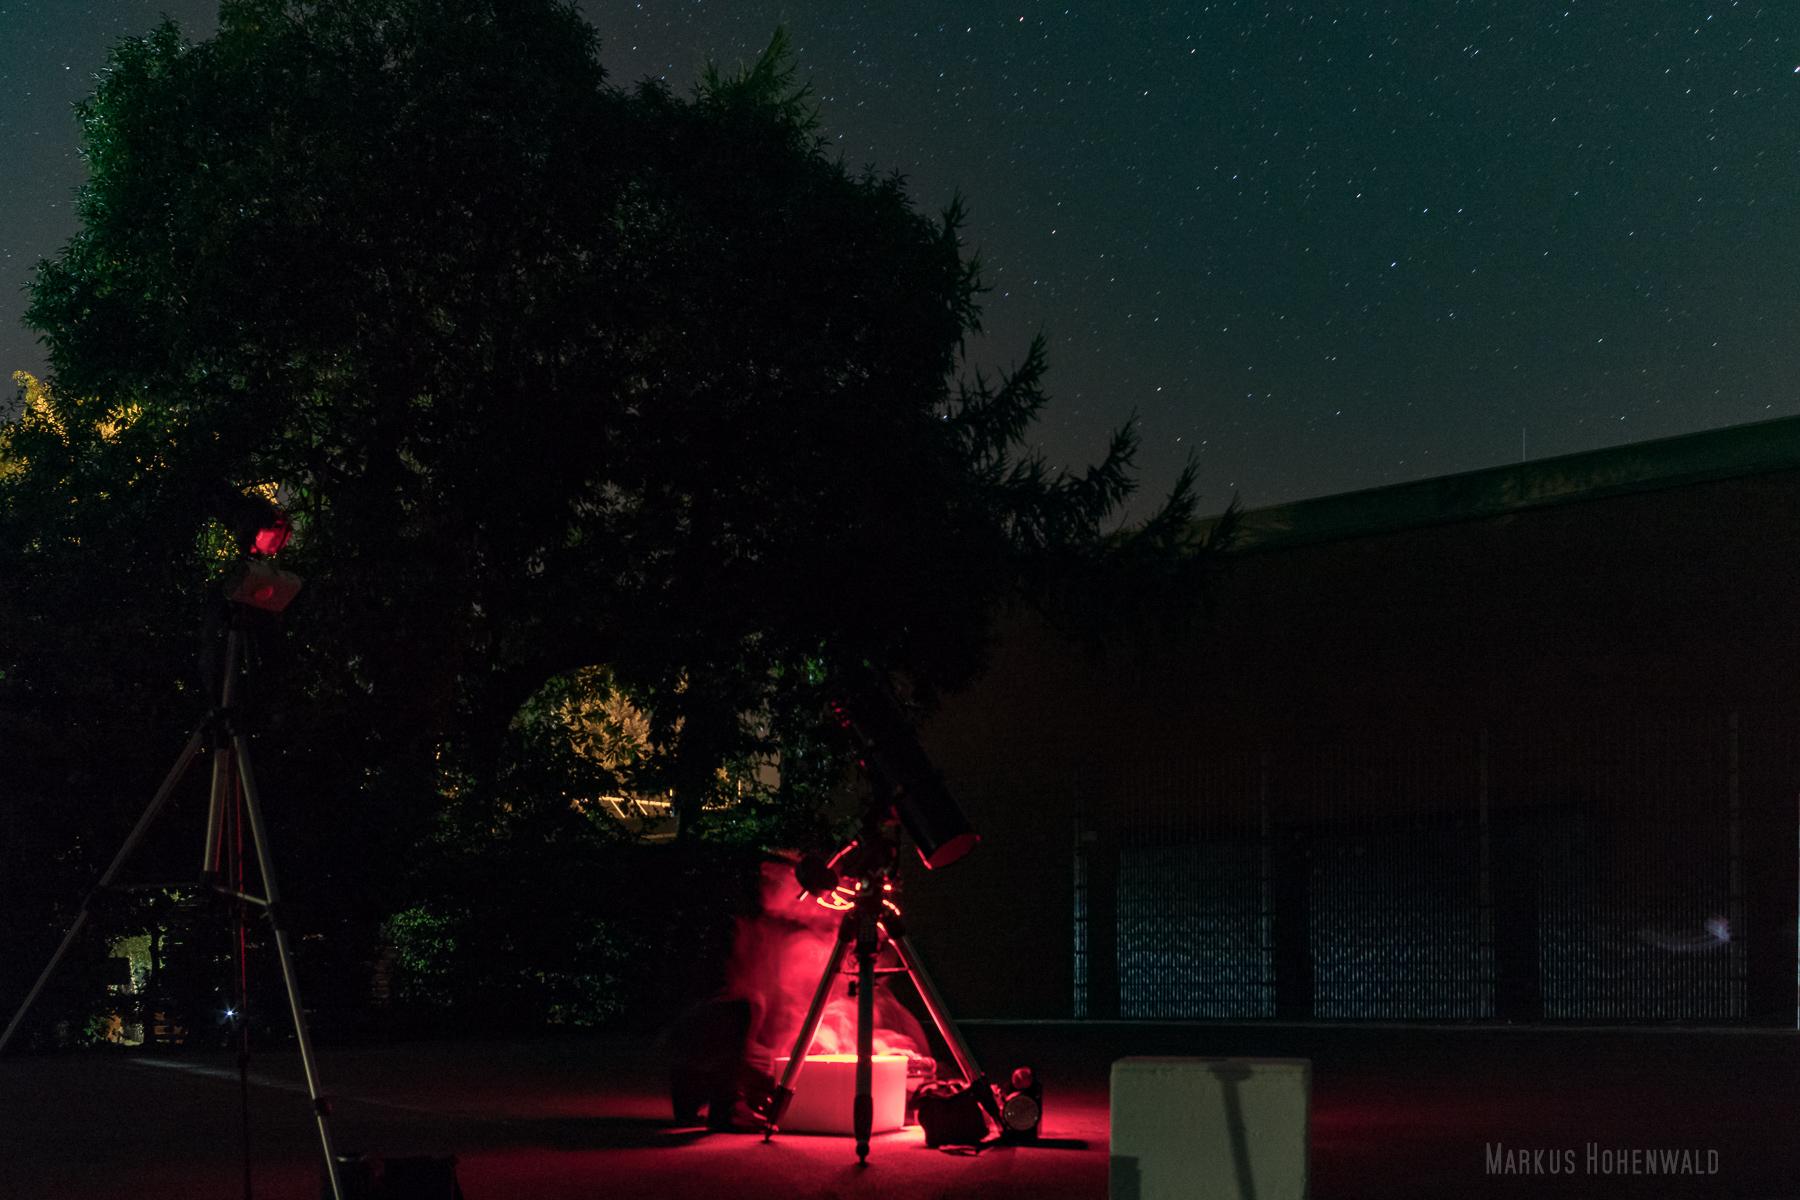 Am Teleskop